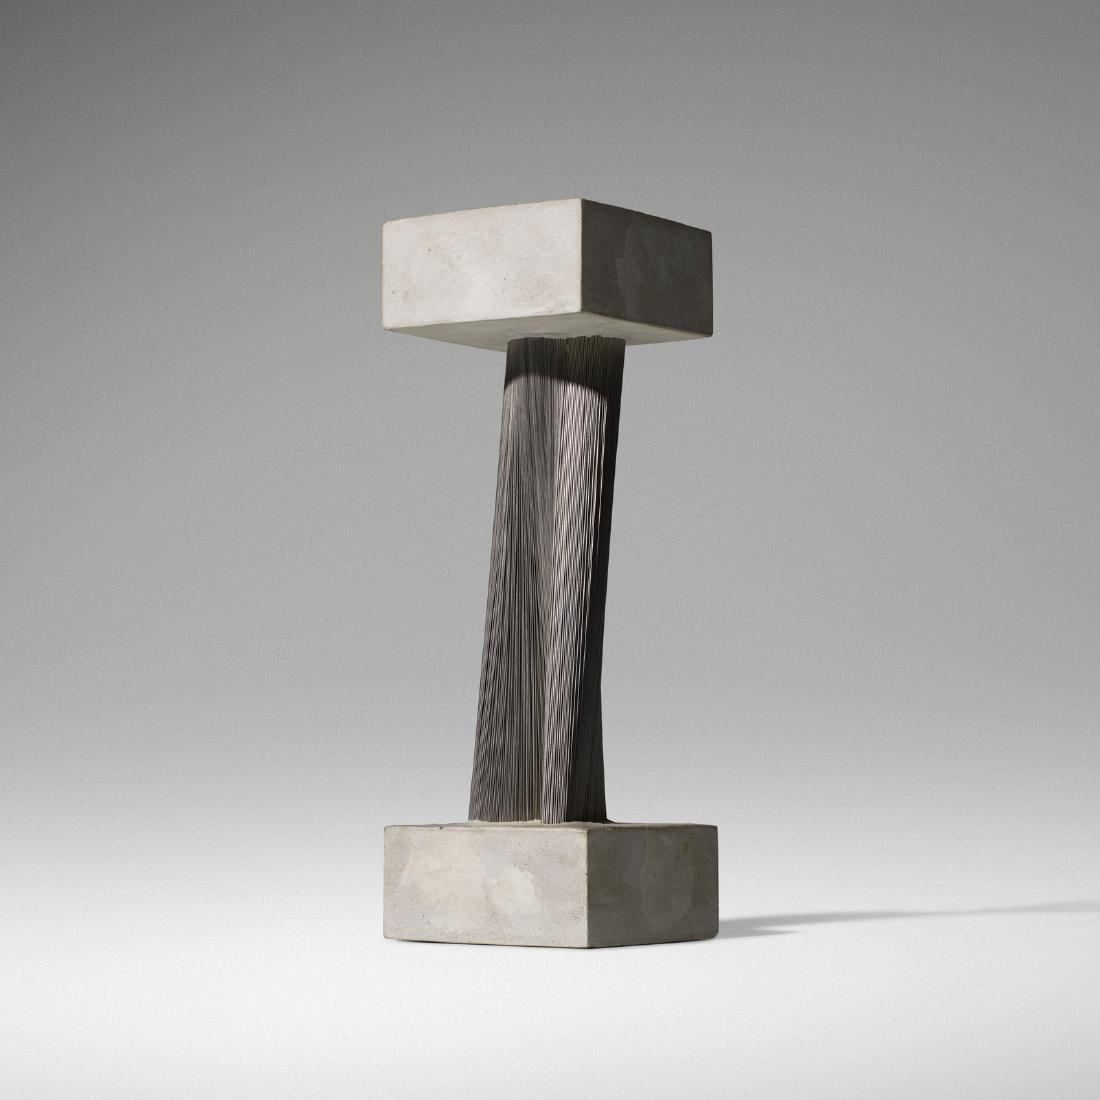 Harry Bertoia, Untitled (Bundled Wire Form)